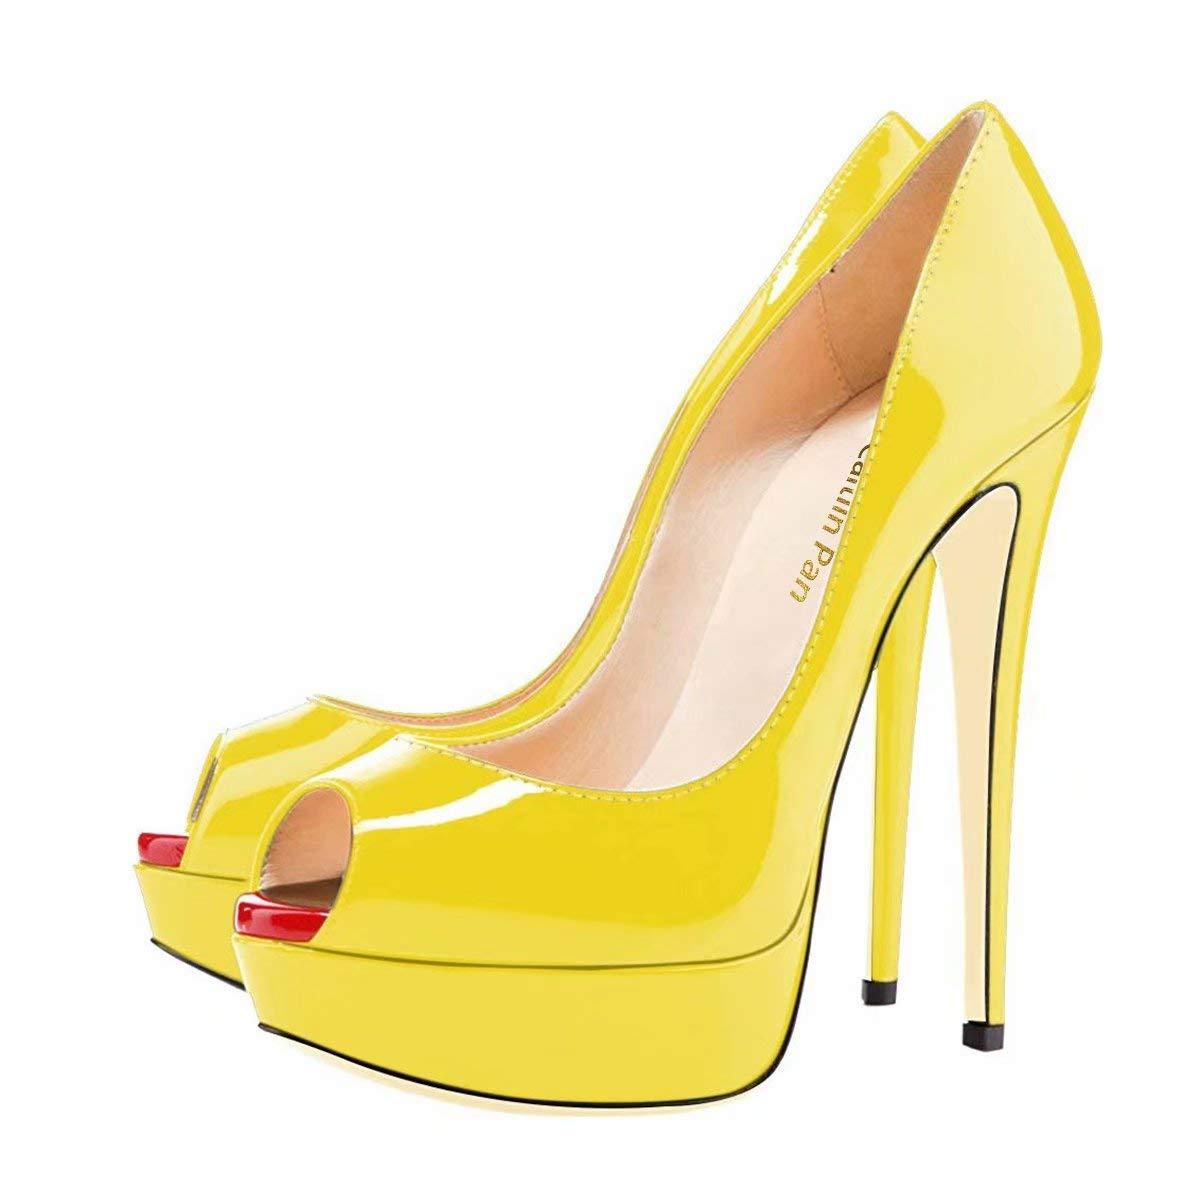 Caitlin Bout Pan 35-45 Femmes Escarpins Toe Plateforme 15CM Escarpins Peep Toe 3CM Plateforme Talon Chaussures Open Toe 35-45 Bout Rouge/ Jaune 77b6174 - reprogrammed.space